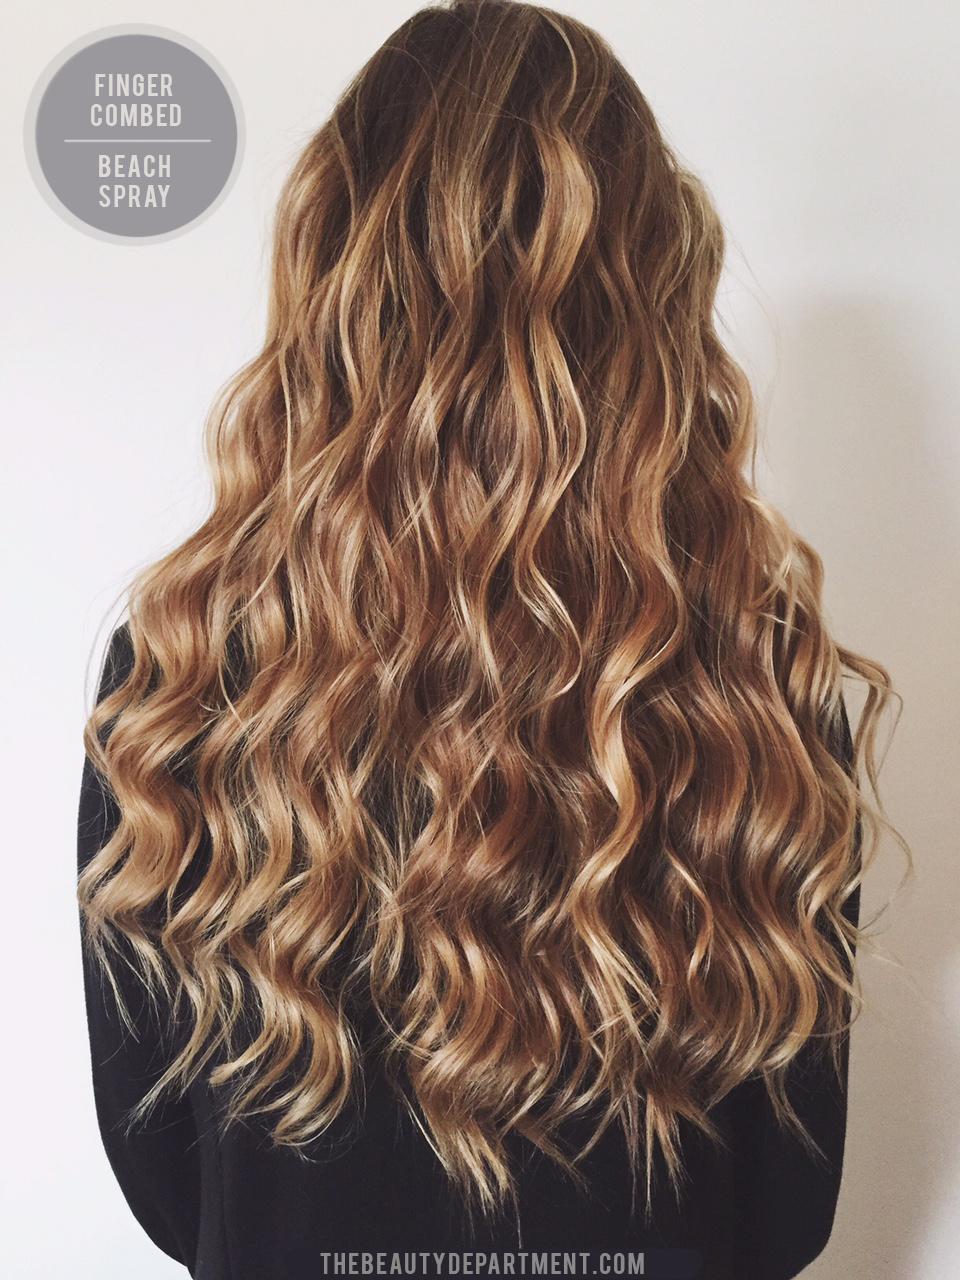 Wand Waves Curls The Beauty Dept